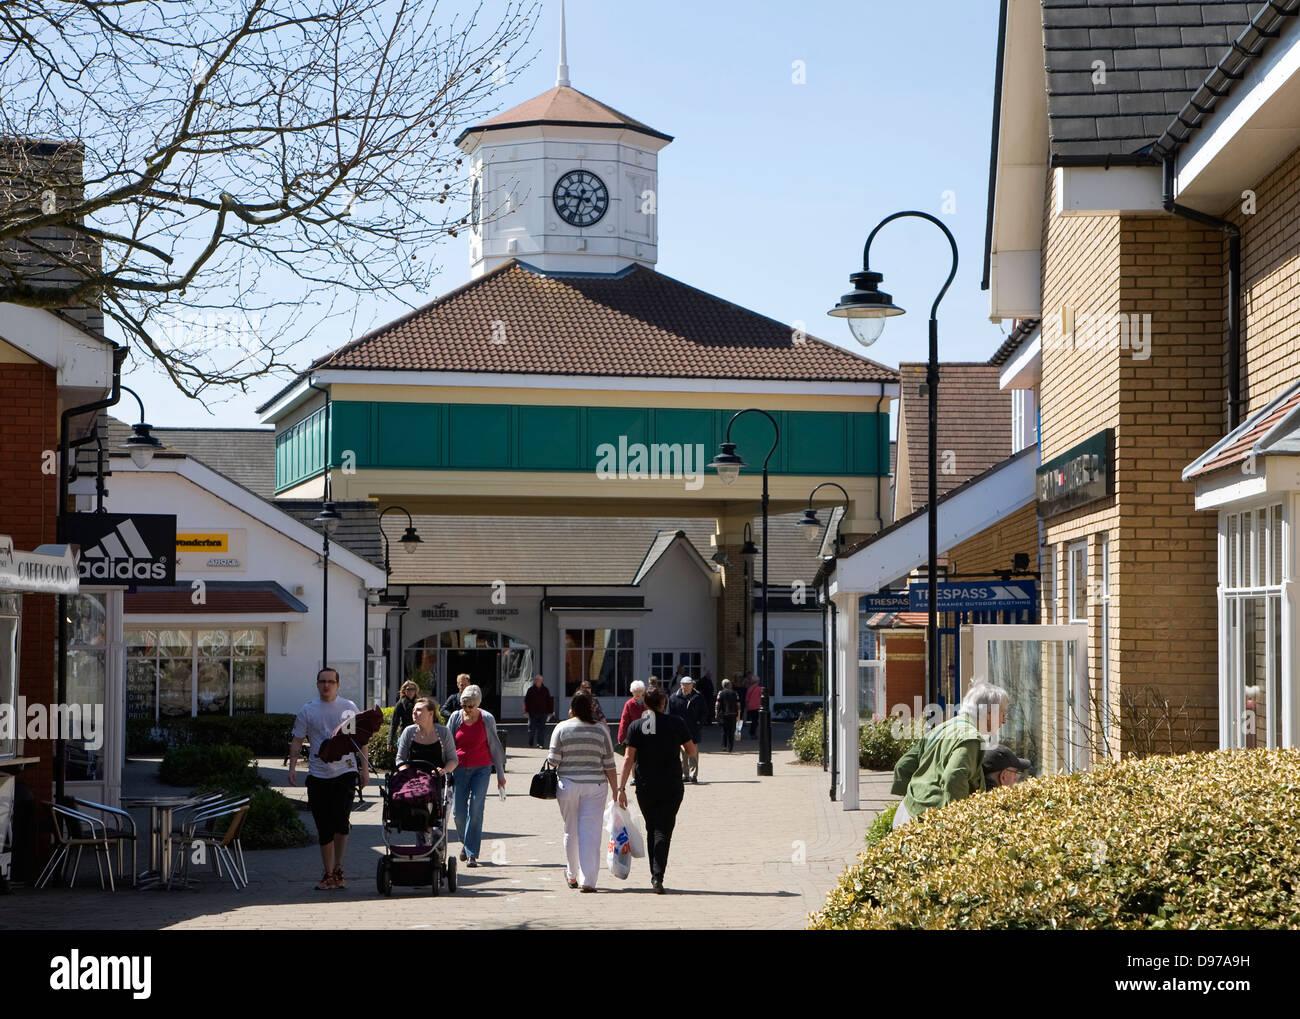 Freeport retail shopping centre, Braintree, Essex, England - Stock Image